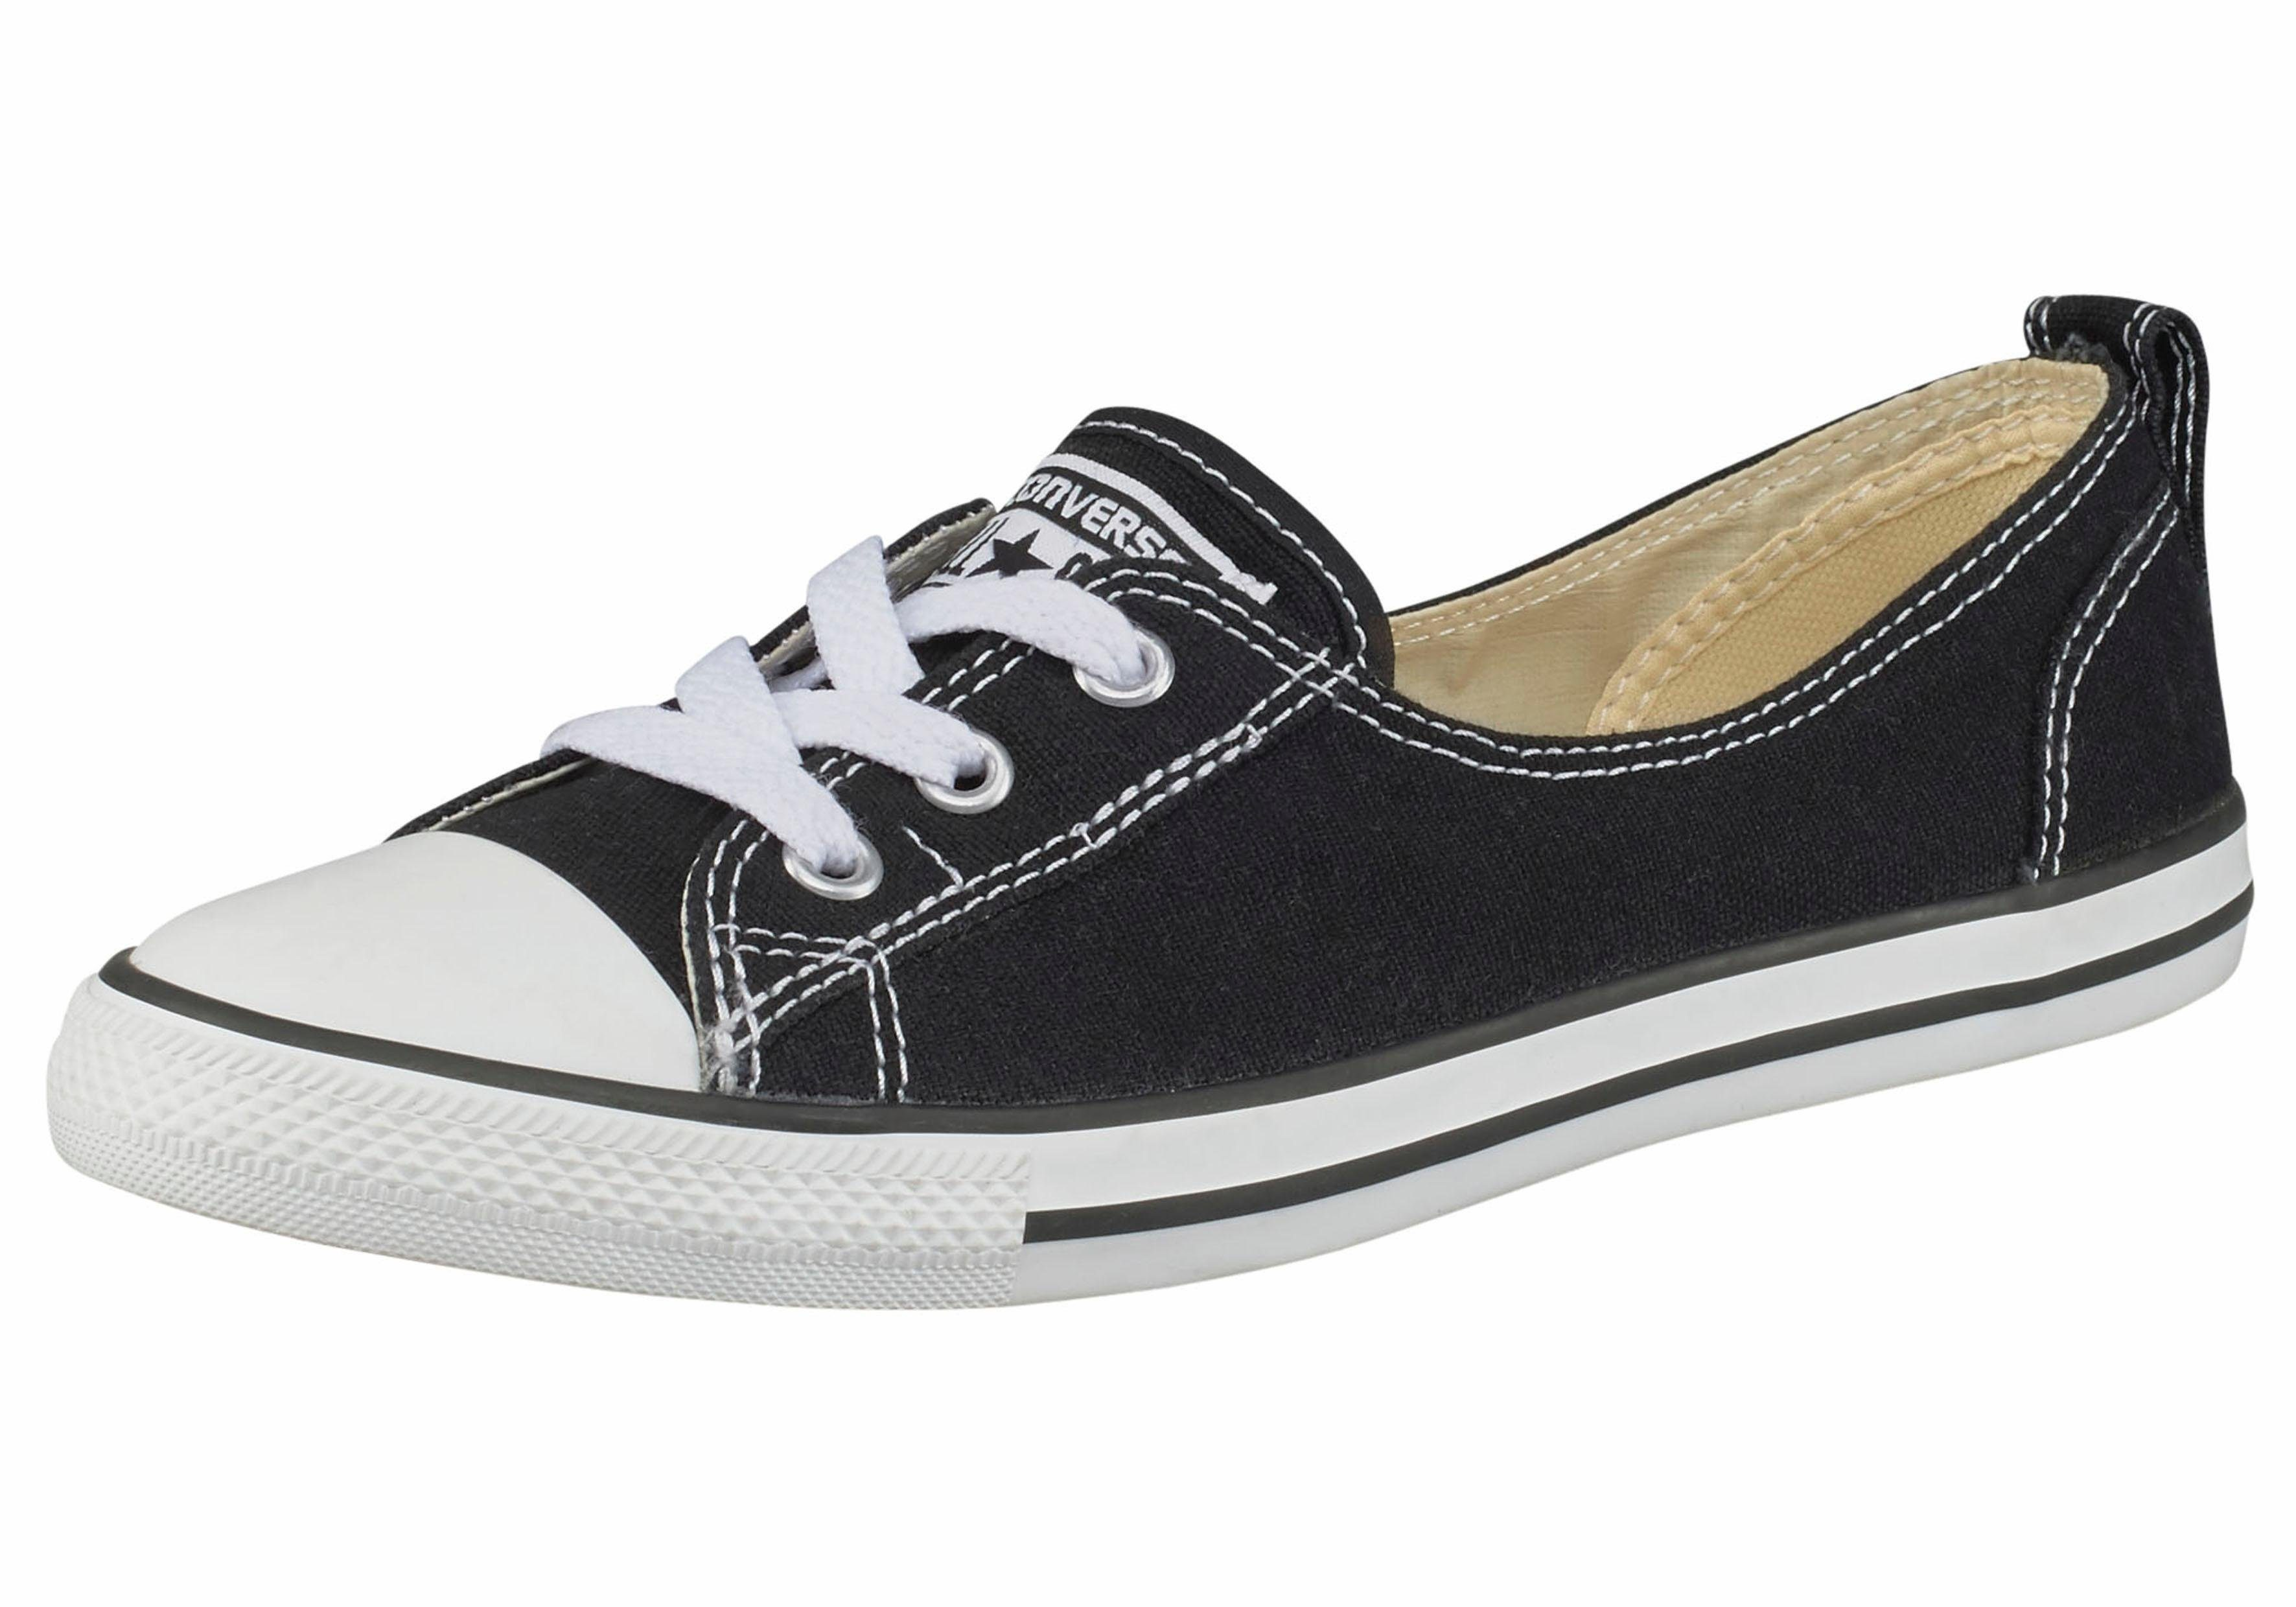 Damen Schuhe sneakers Converse Chuck Taylor Ballet Lace